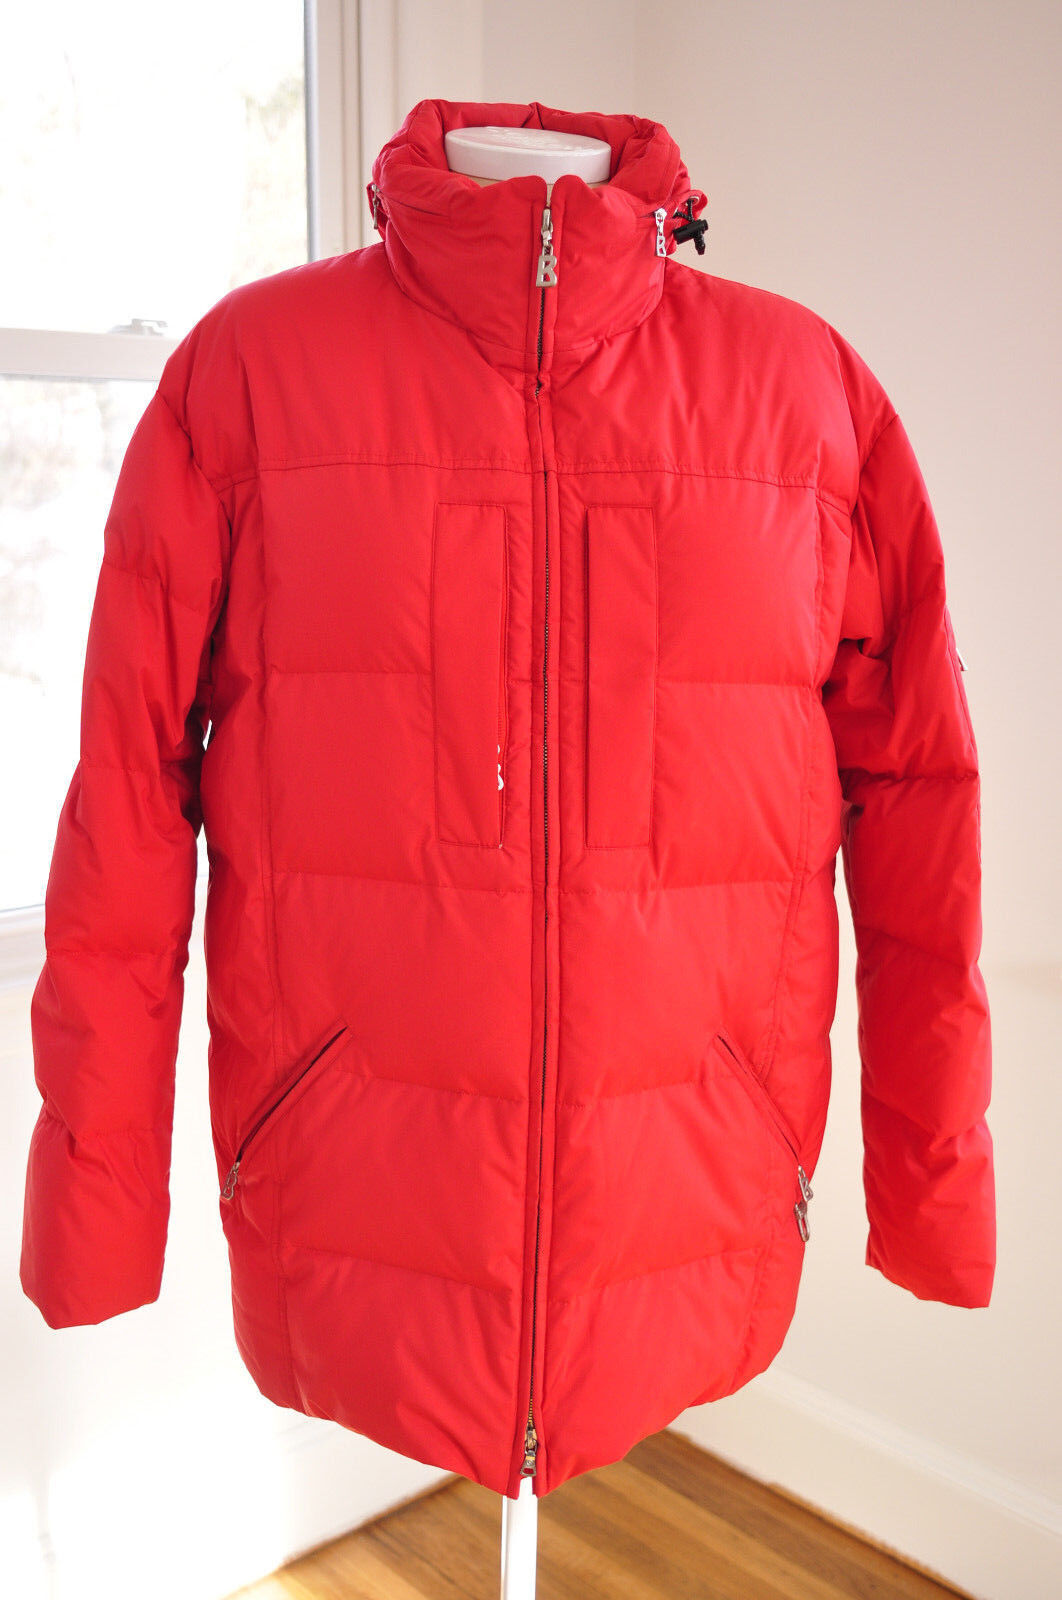 Купить Bogner - Bogner goose down puffer parka ski jacket NWT Sz 40 US